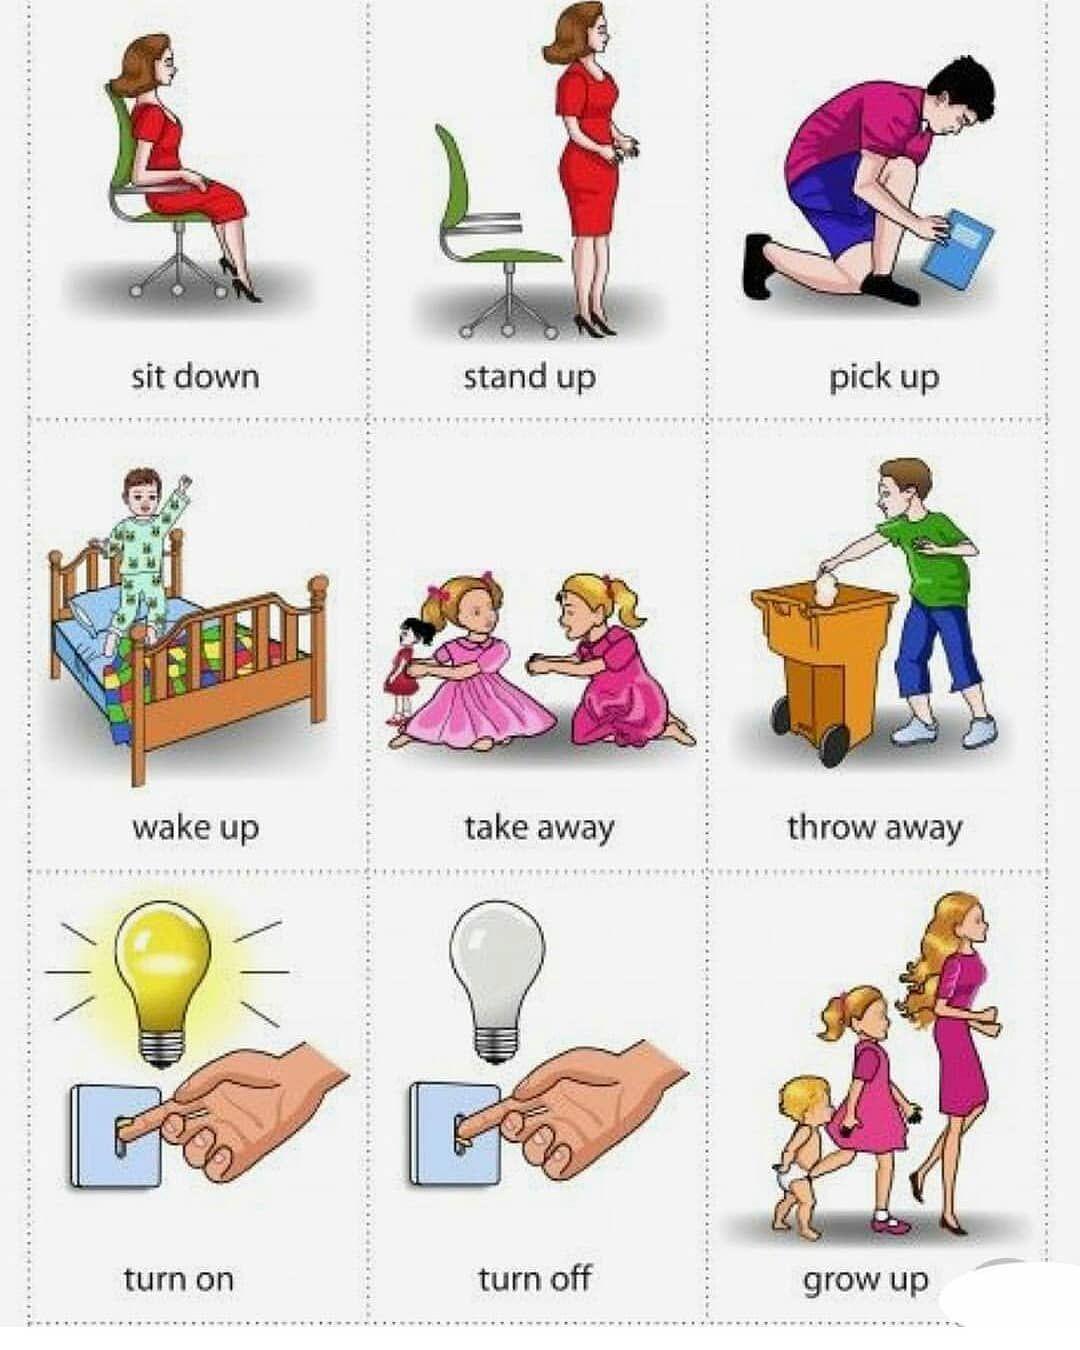 Follow English Grammar Vocabulary For More